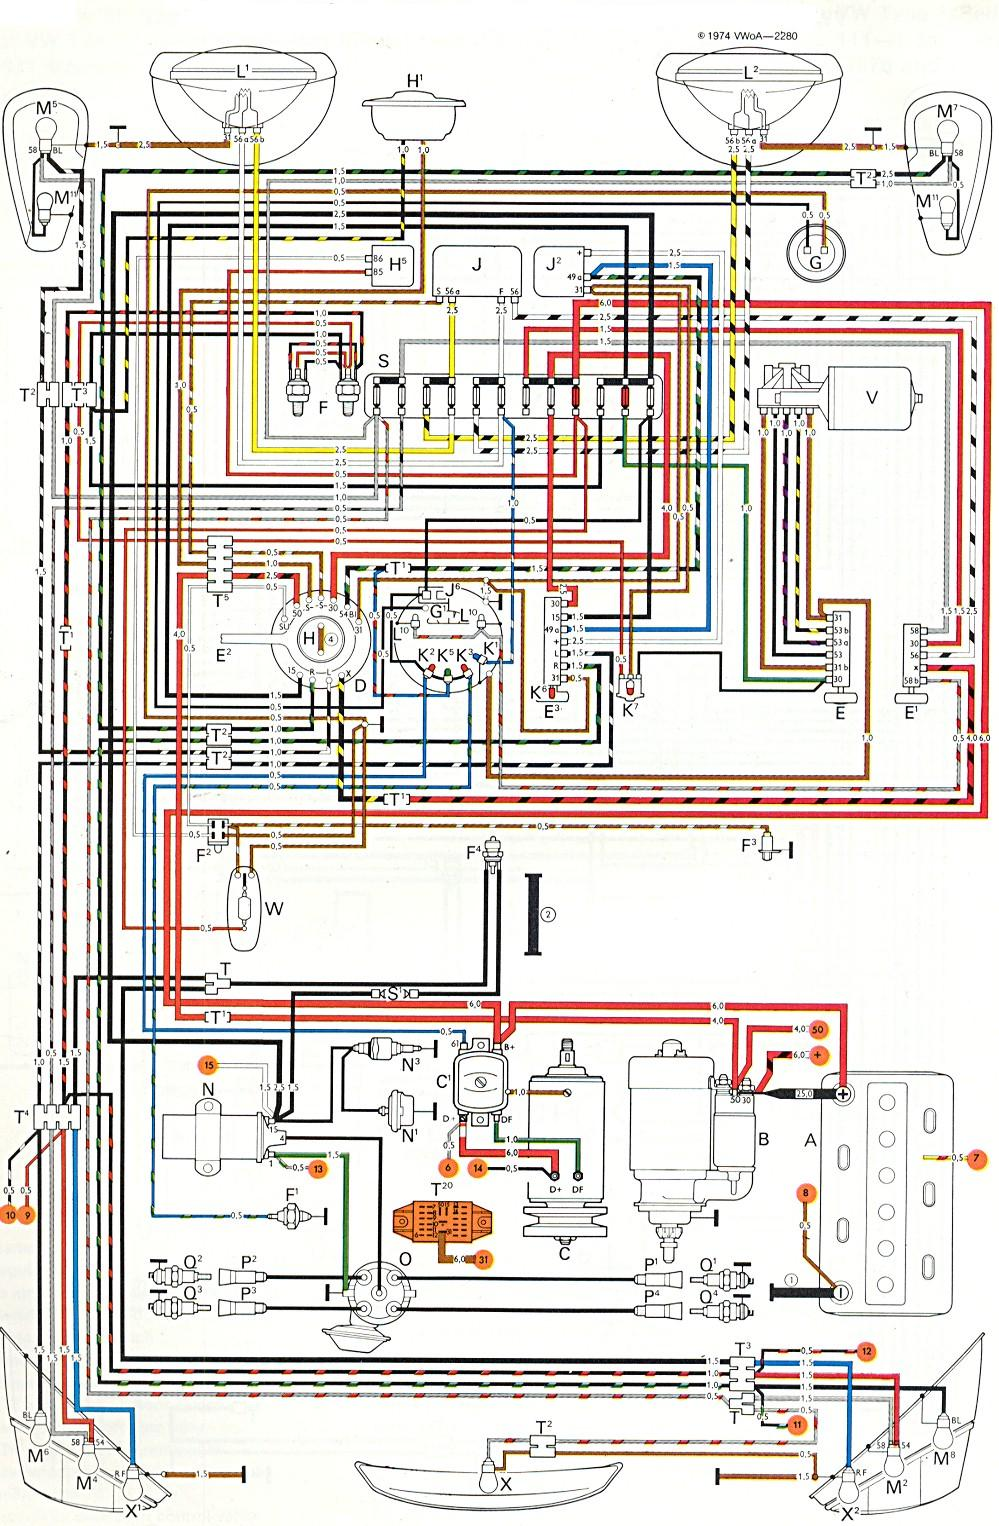 Brilliant 74 Vw Engine Diagram Today Diagram Data Schema Wiring Cloud Ymoonsalvmohammedshrineorg